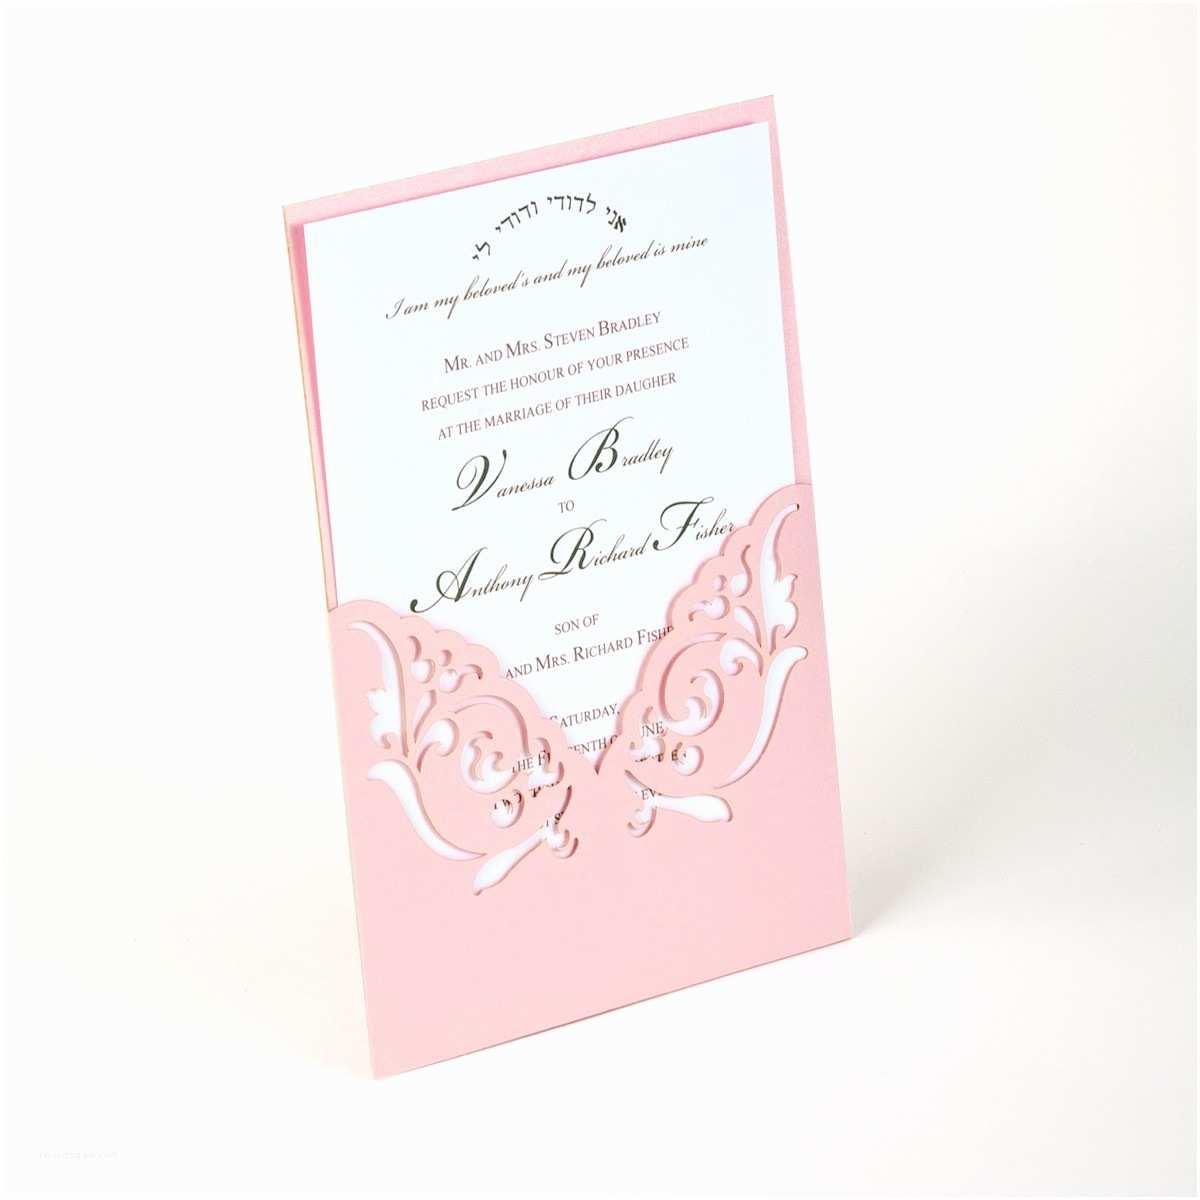 Elegant Pocket Wedding Invitations Pocket Elegant Wedding Invitation Laser Cut Invitations